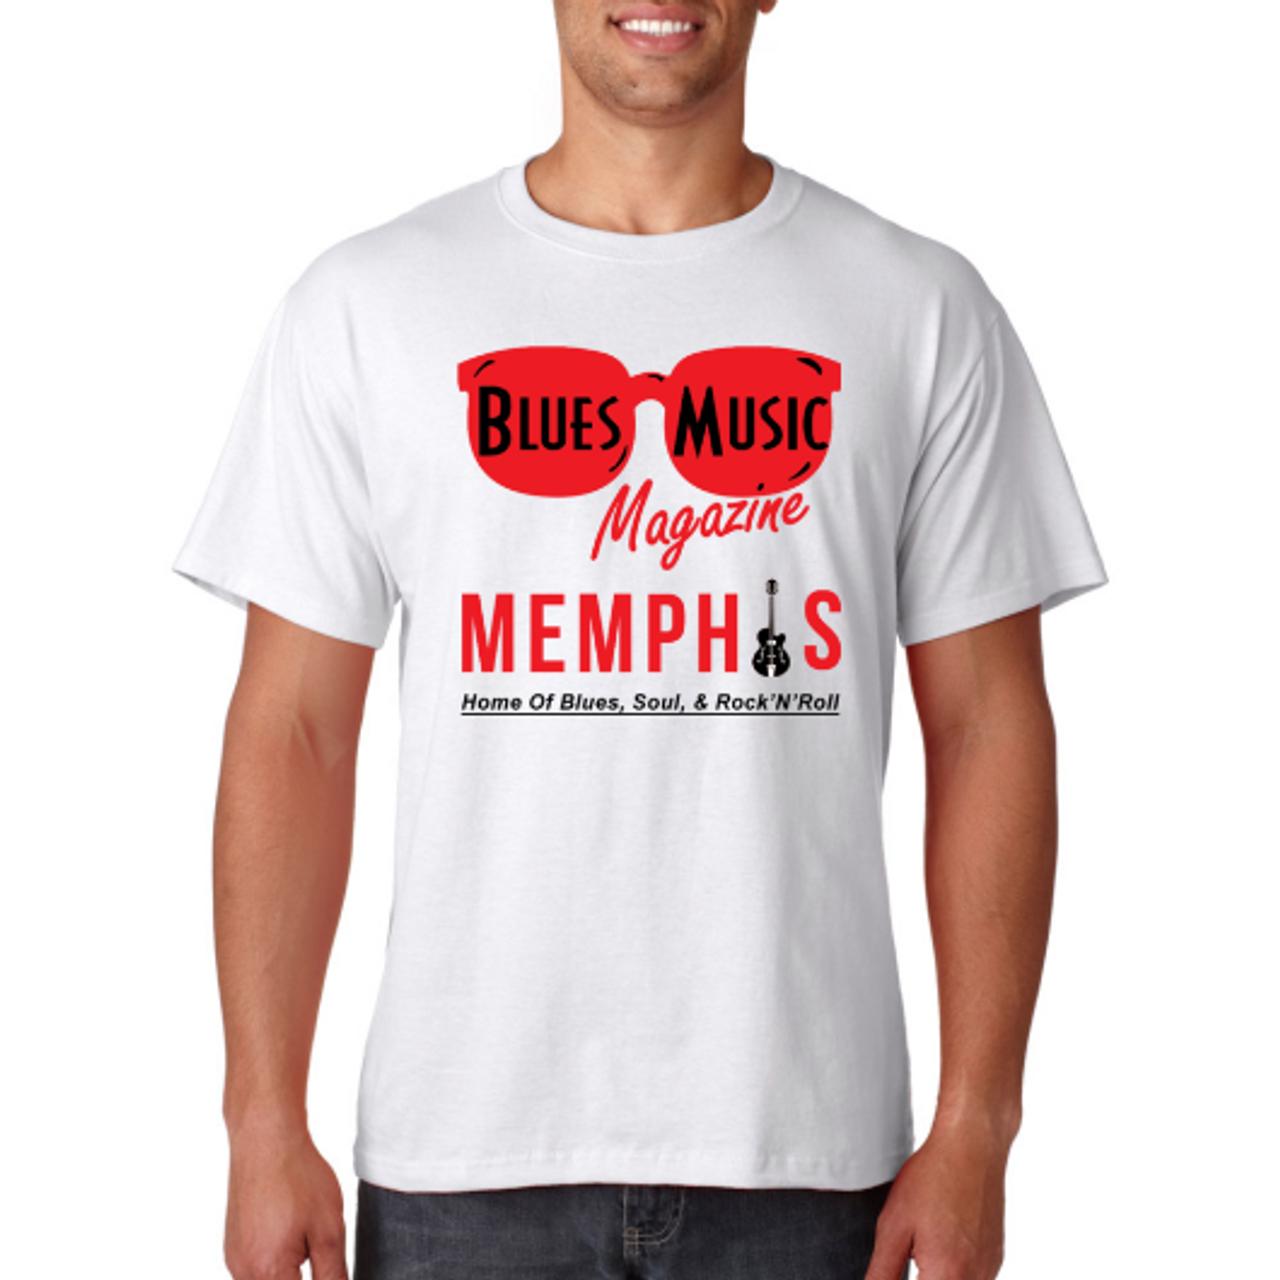 BLUES MUSIC MAGAZINE MEMPHIS LOGO SHIRT